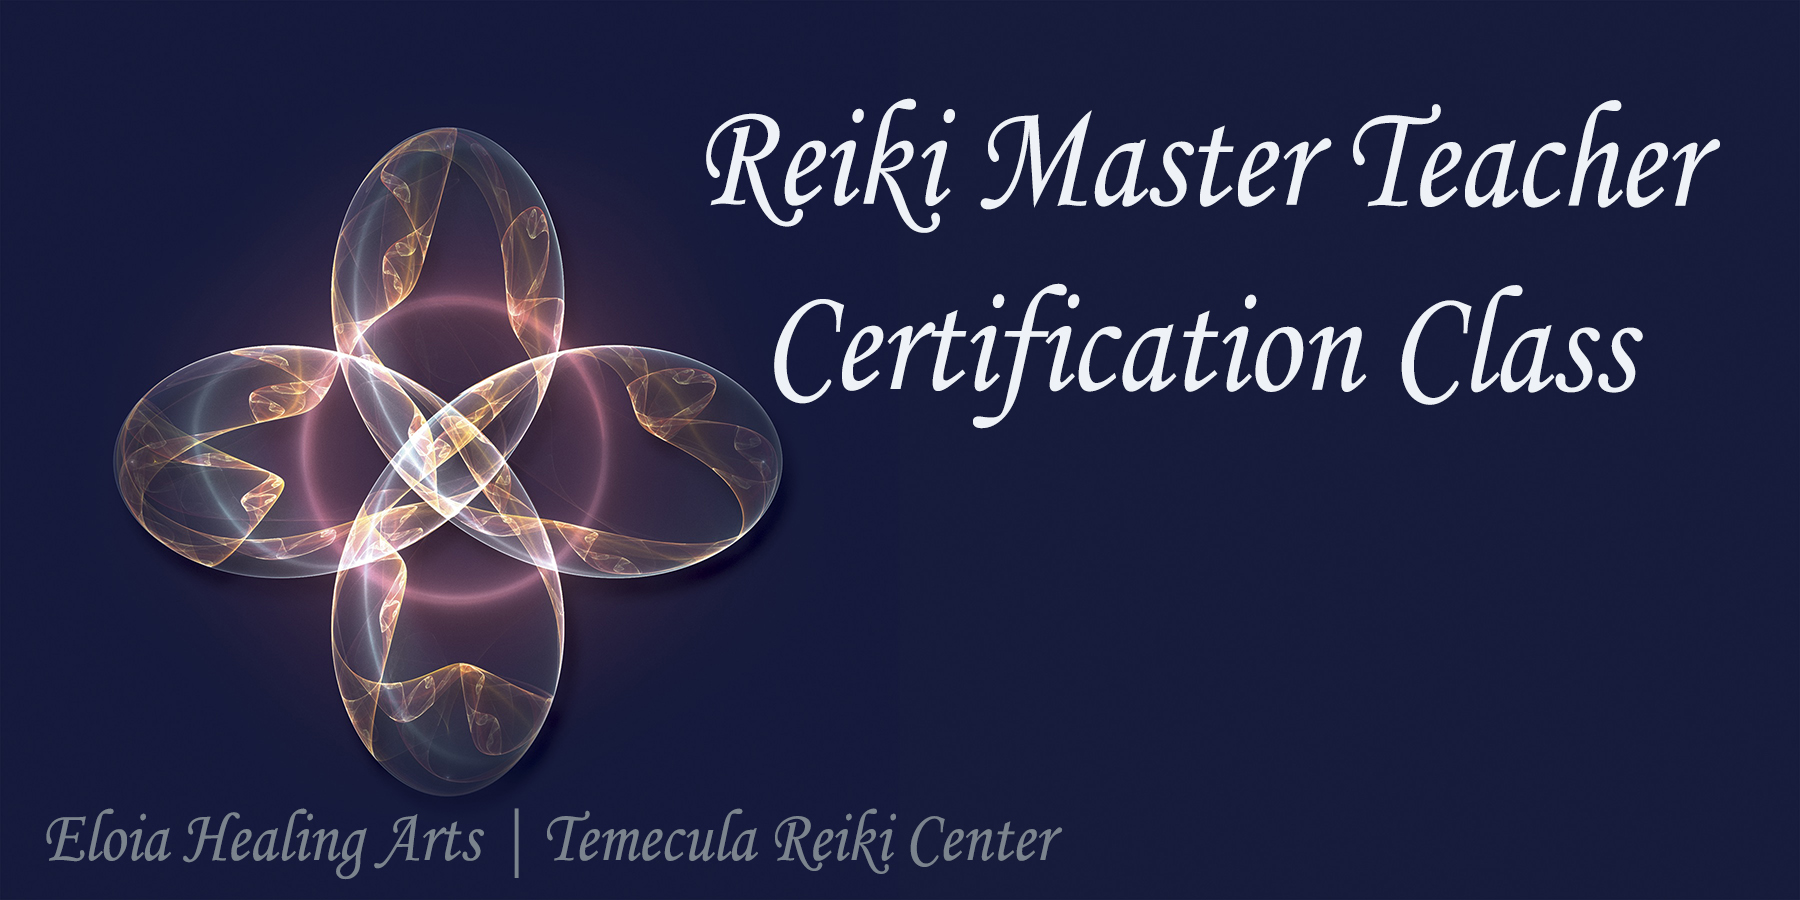 Reiki master teacher certification eloia healing arts reiki master teacher certification biocorpaavc